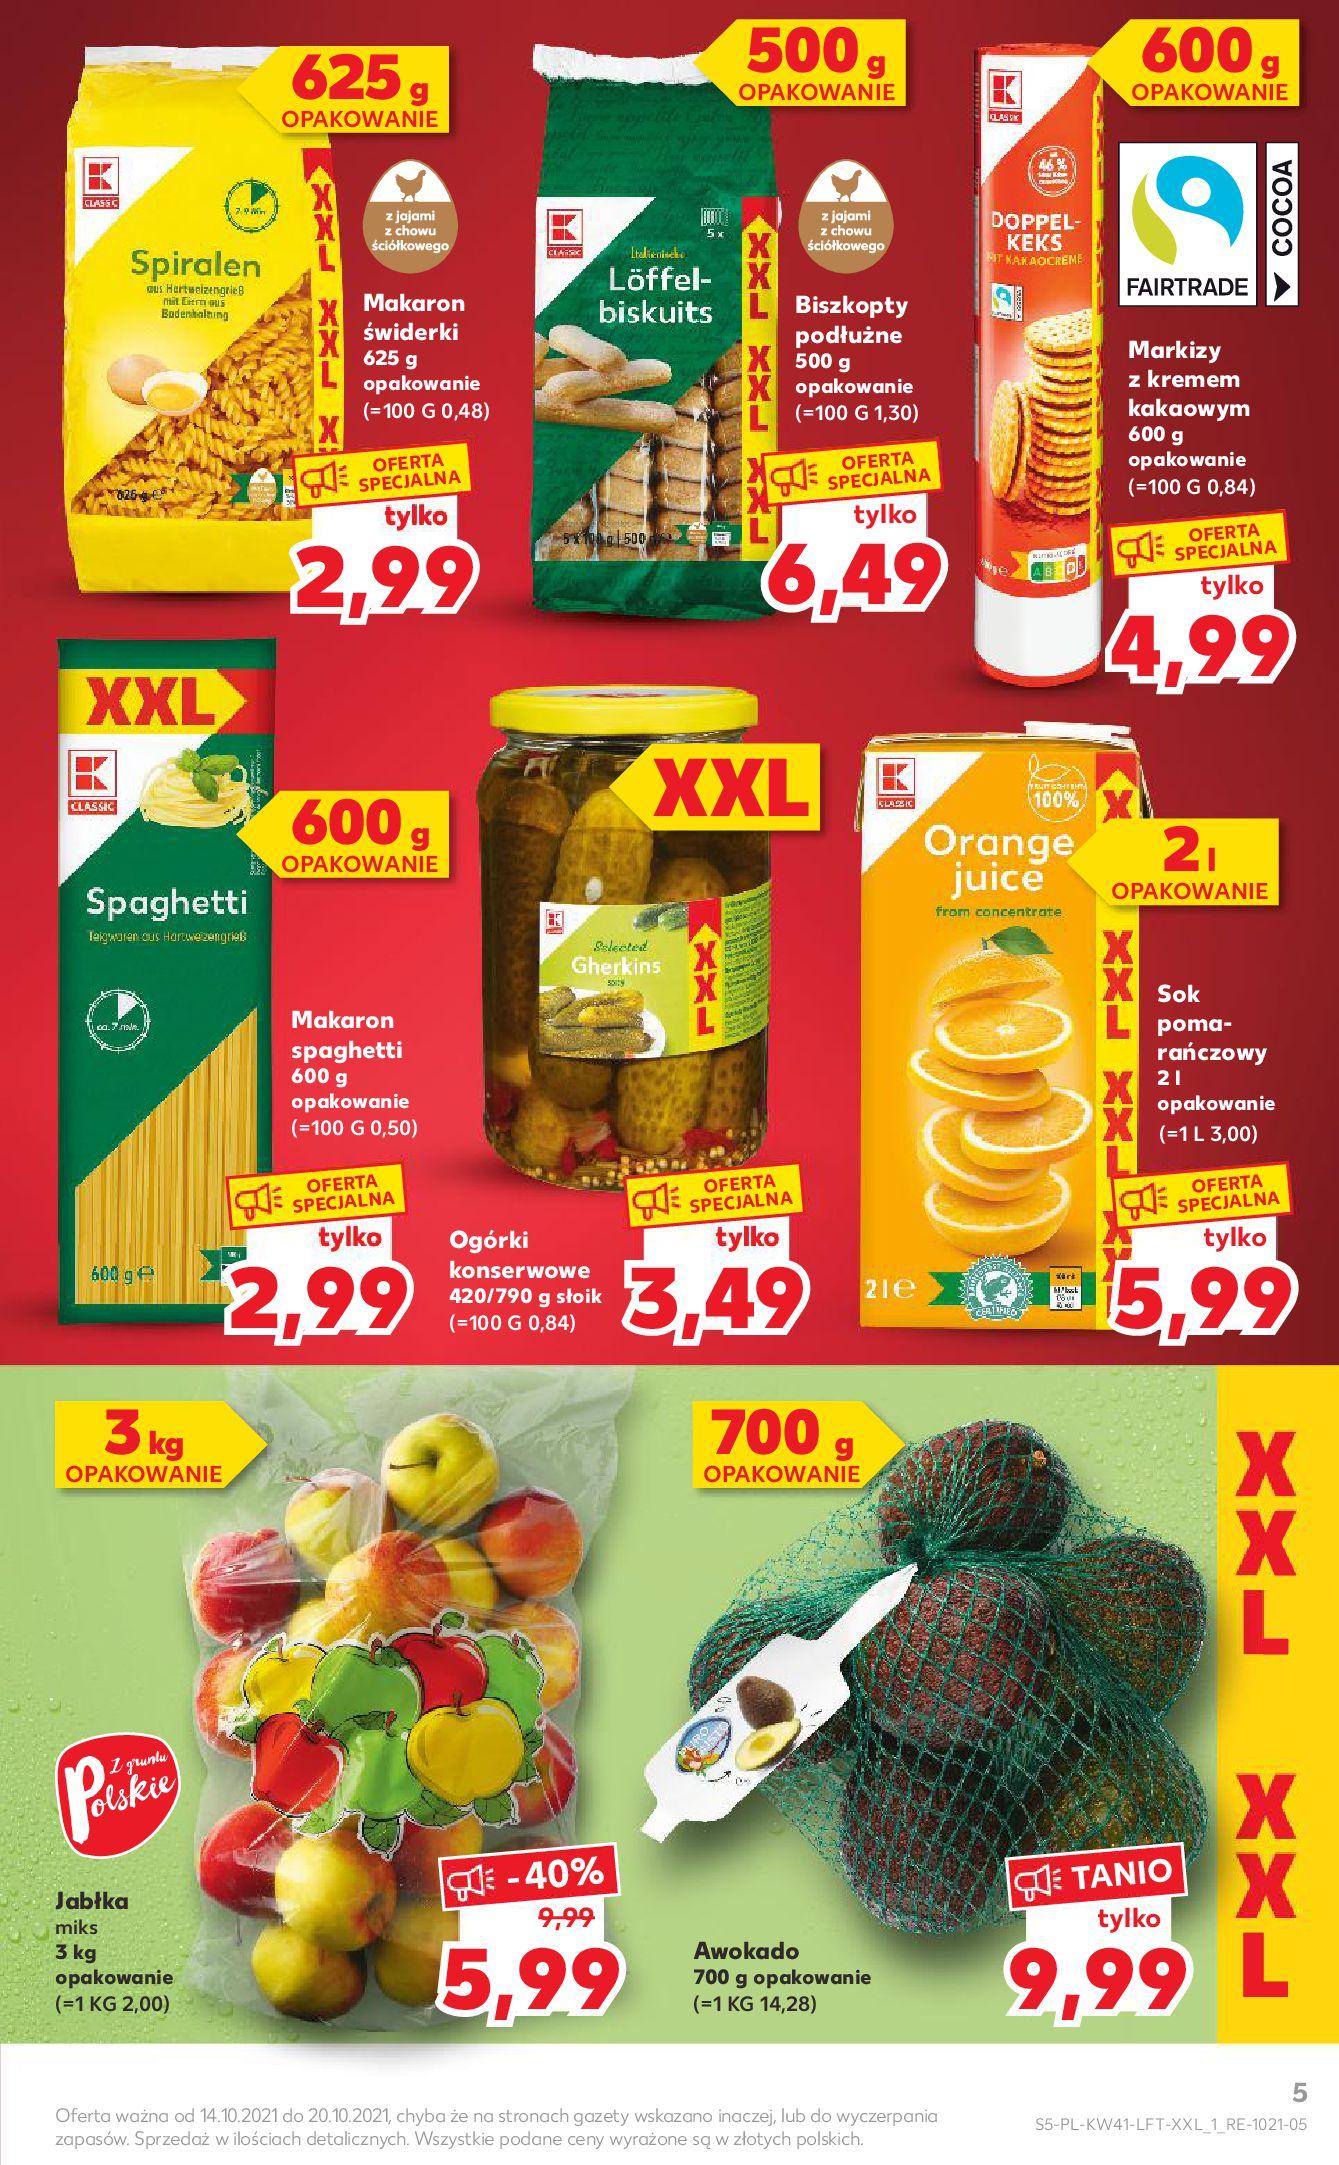 Gazetka Kaufland: Gazetka Kaufland 14-20.10. 2021-10-14 page-5